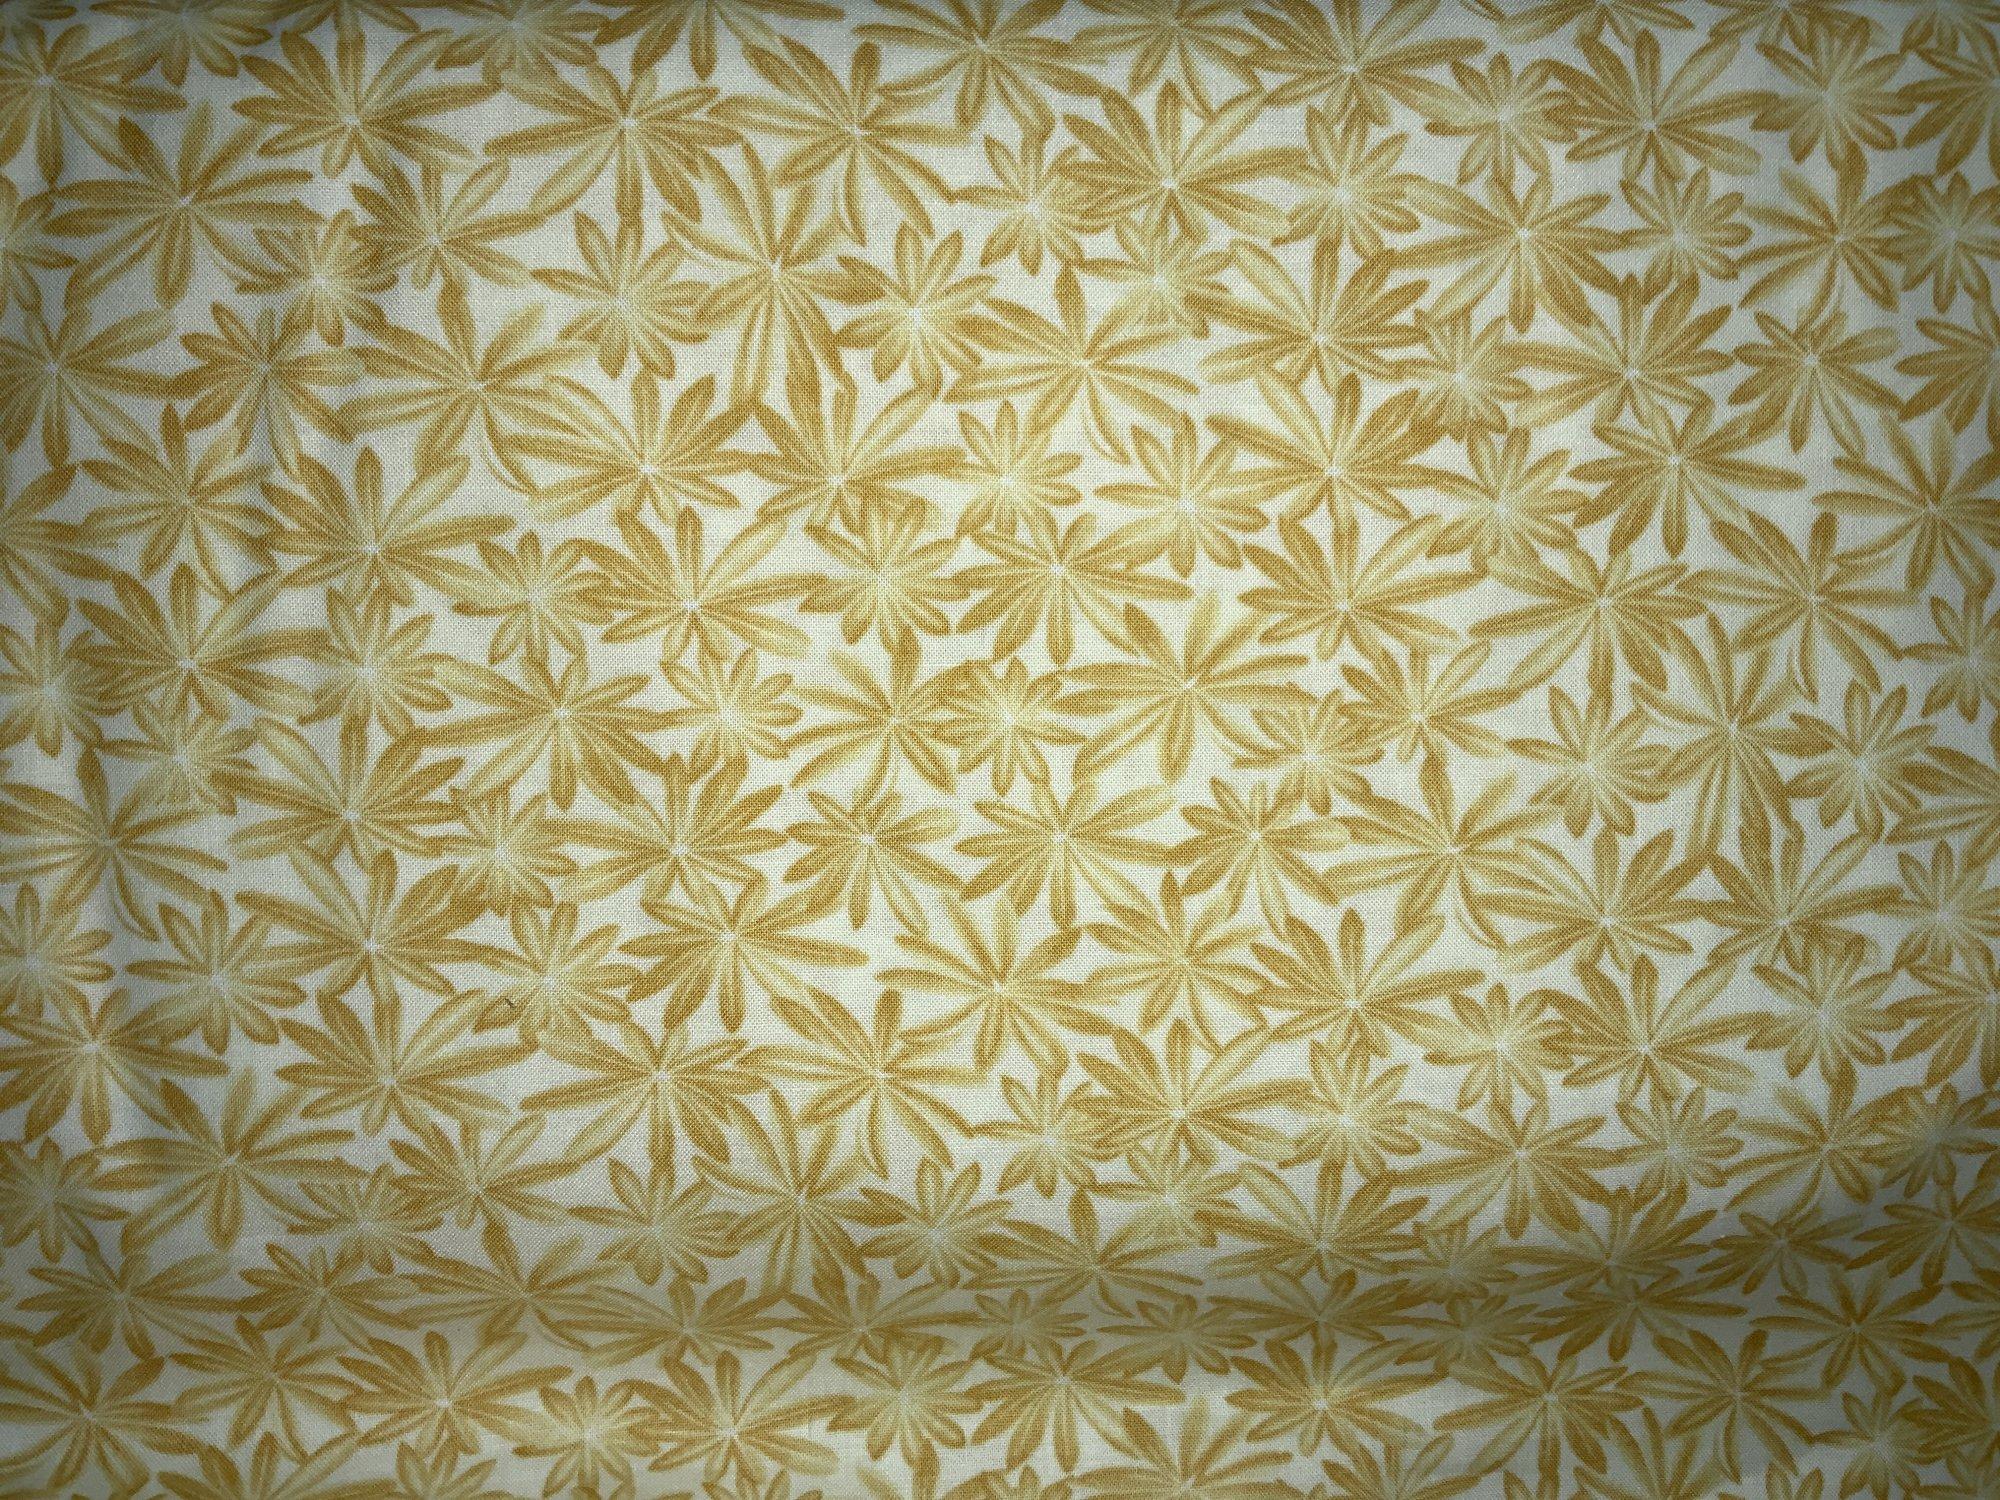 A Wildflower Meadow yellow flowers